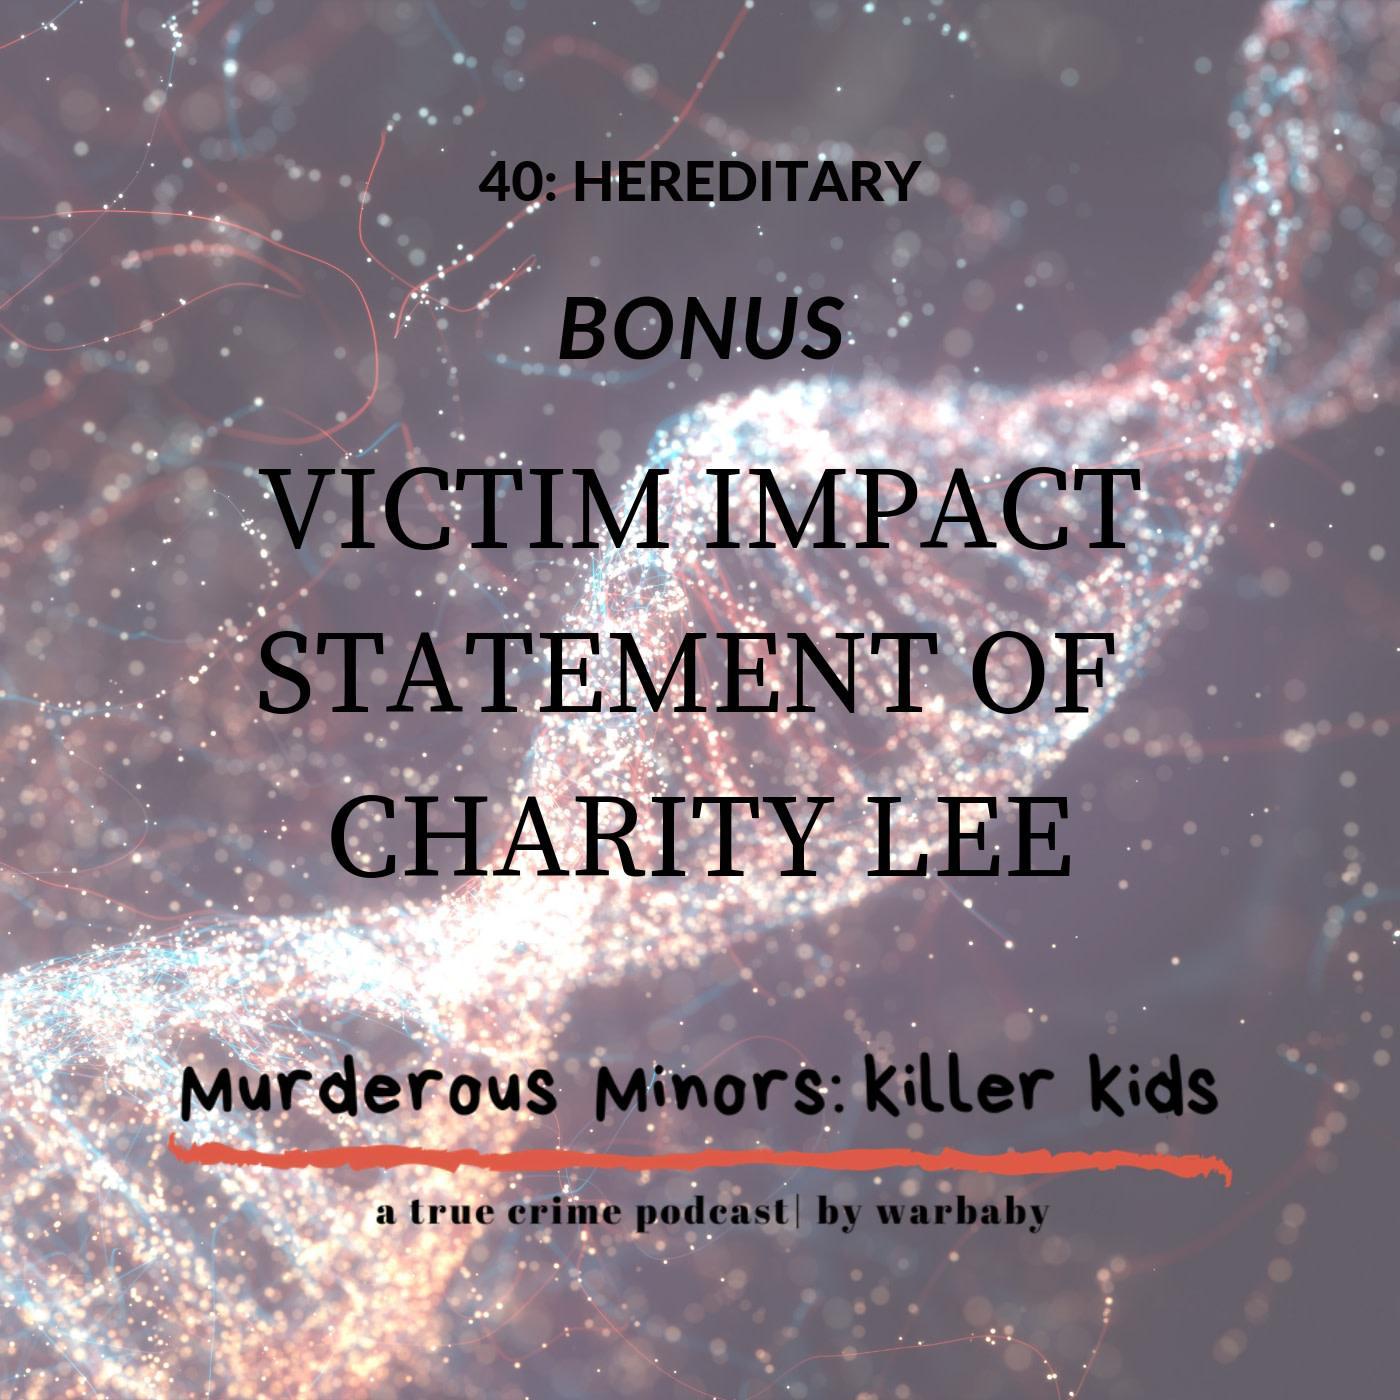 Murderous Minors: killer kids (podcast) - Murderous Minors